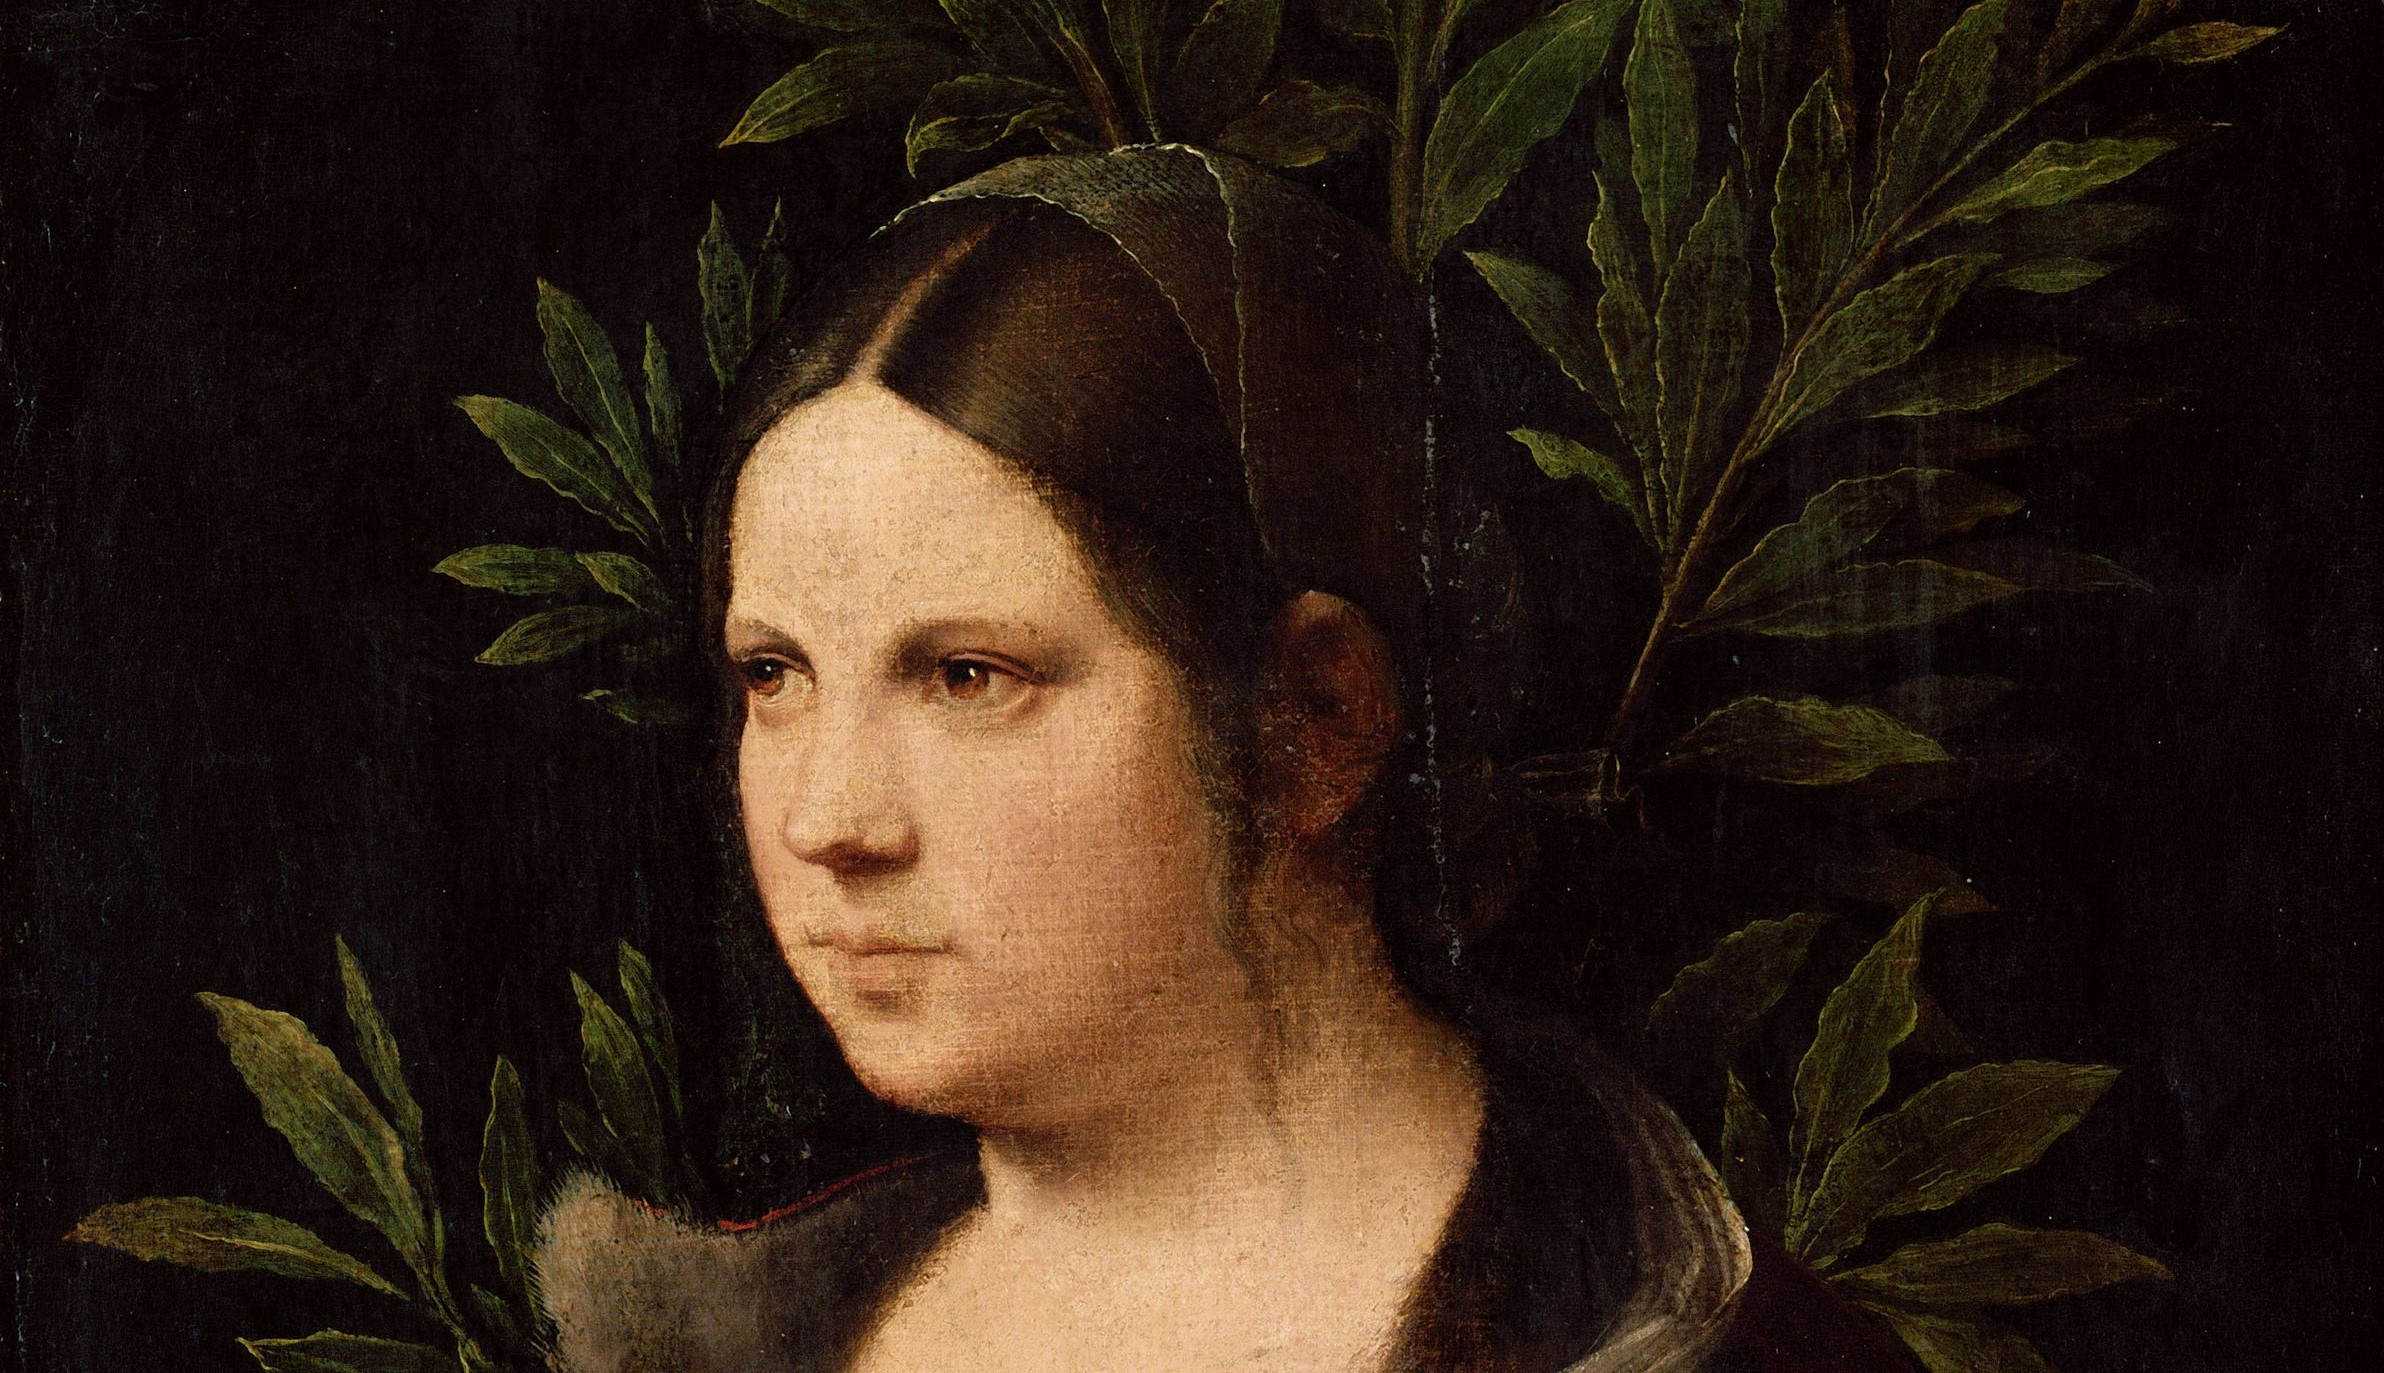 Fascino ed eterna curiosità: le misteriose opere di Giorgione svelate da Tom Nichols